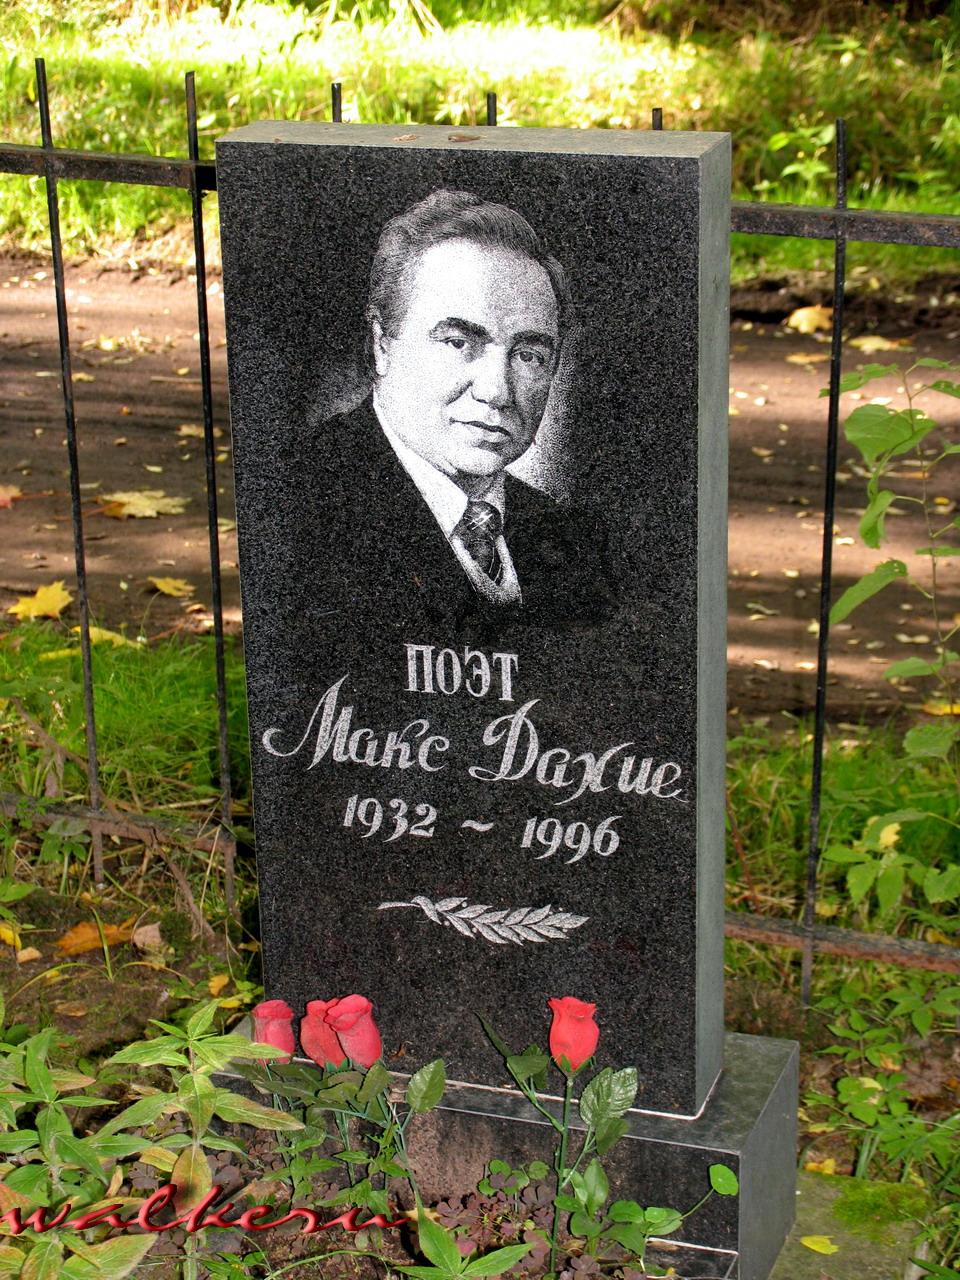 Могила Д.Ю. на кладбище Памяти жертв 9-го января